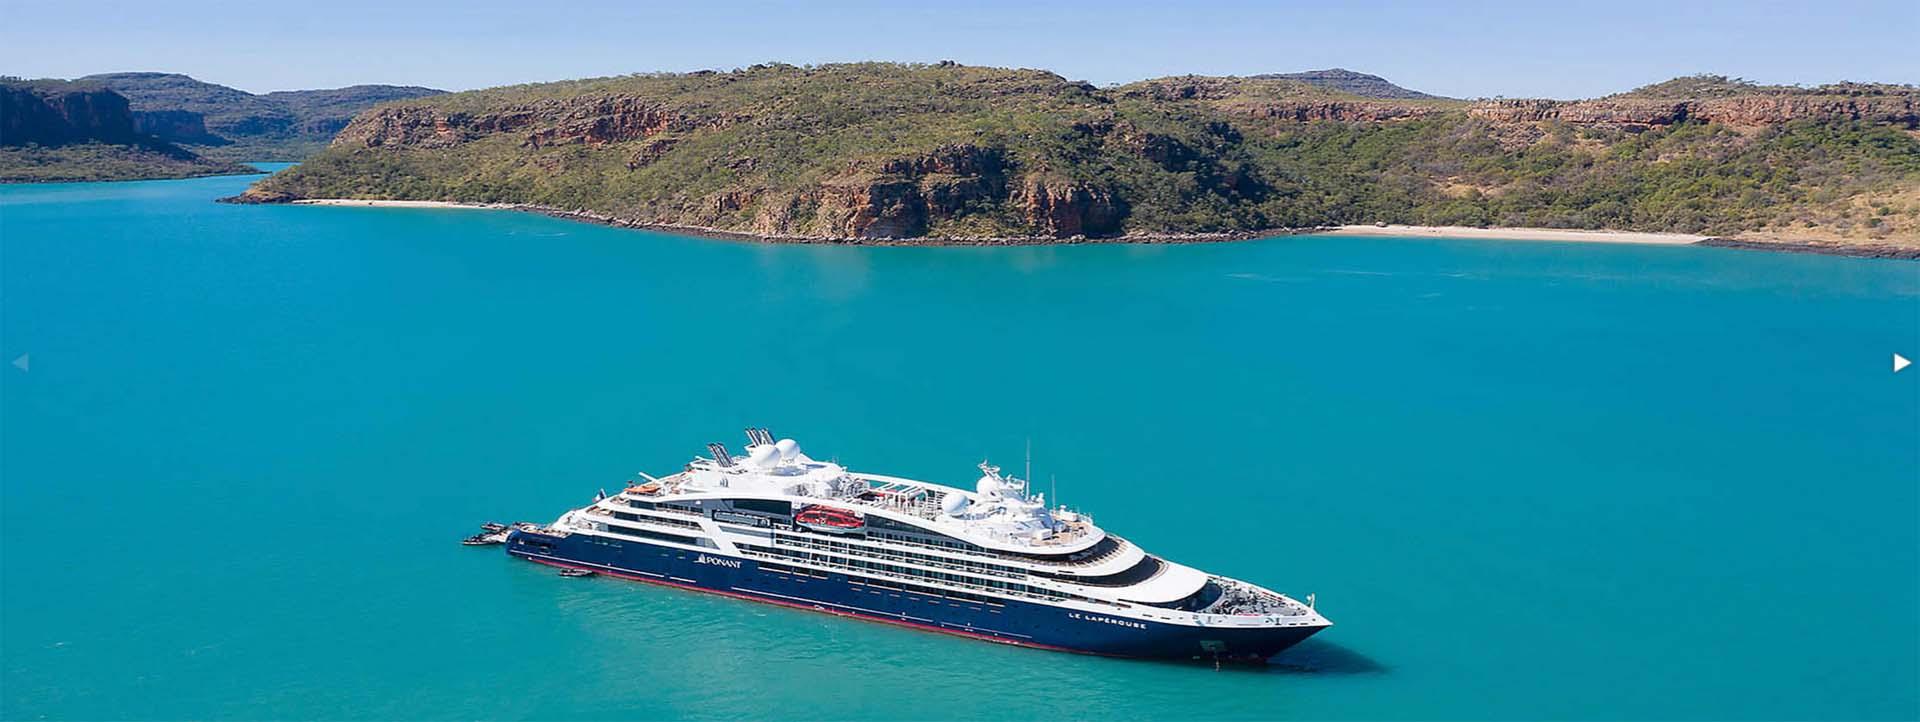 LE LAPERPOUSE Kimberley coast cruises aerial drone photo